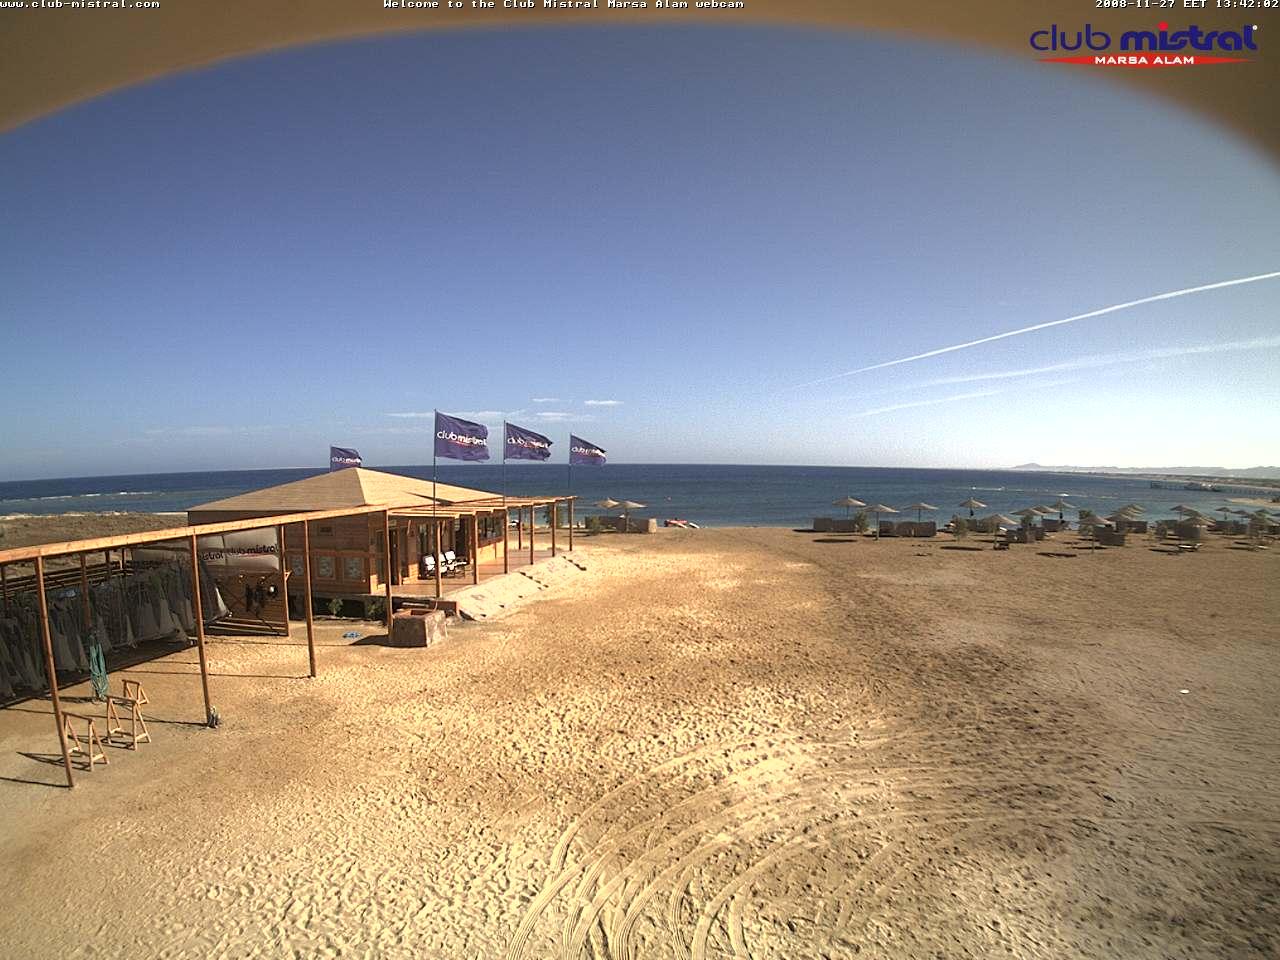 Beach of Marsa Alam photo 5